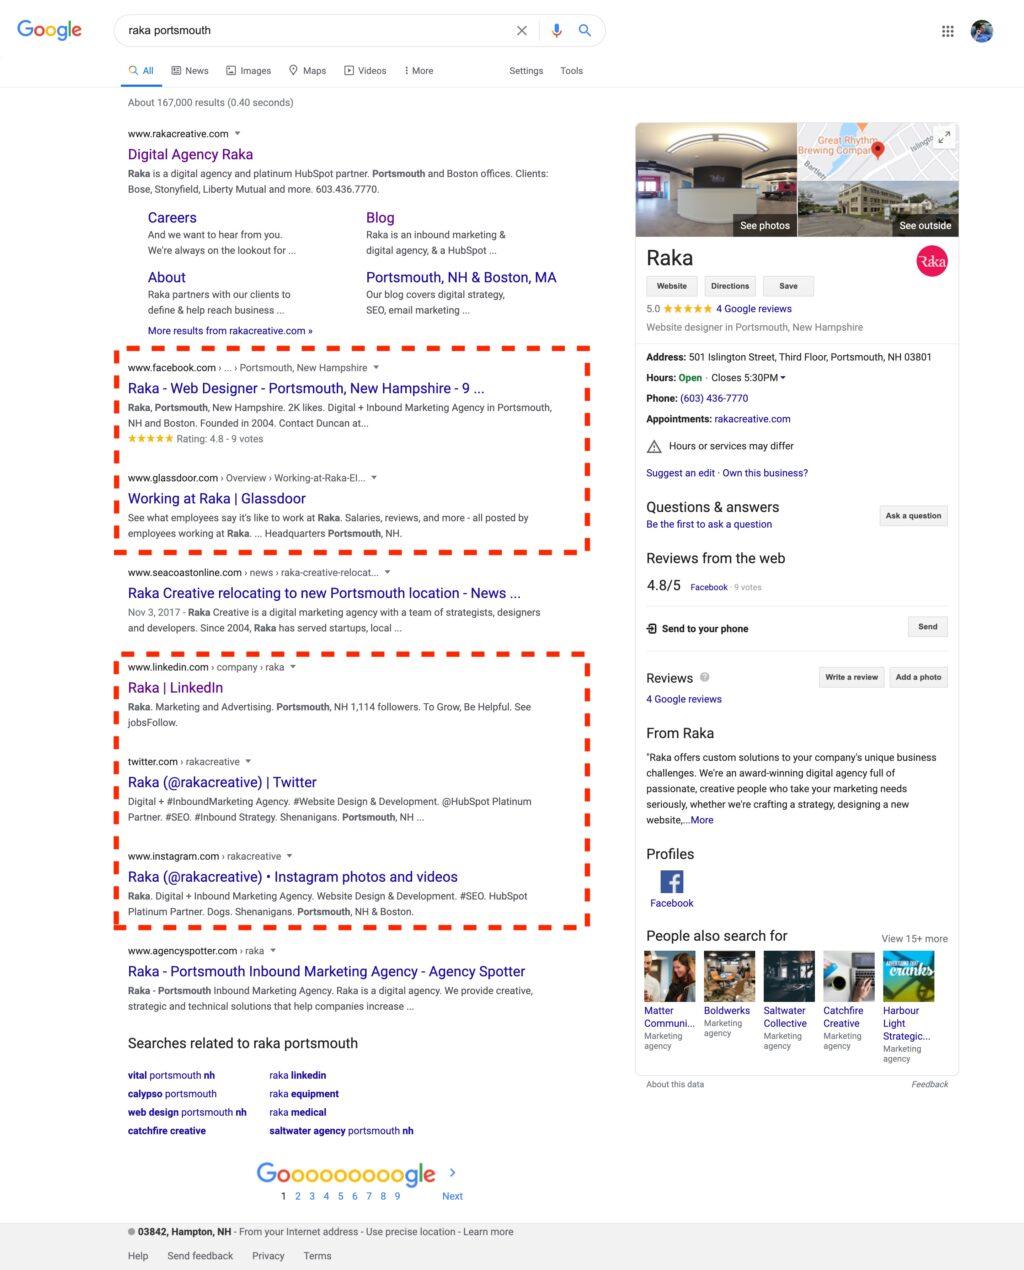 Google SERP showing social media listings for Raka